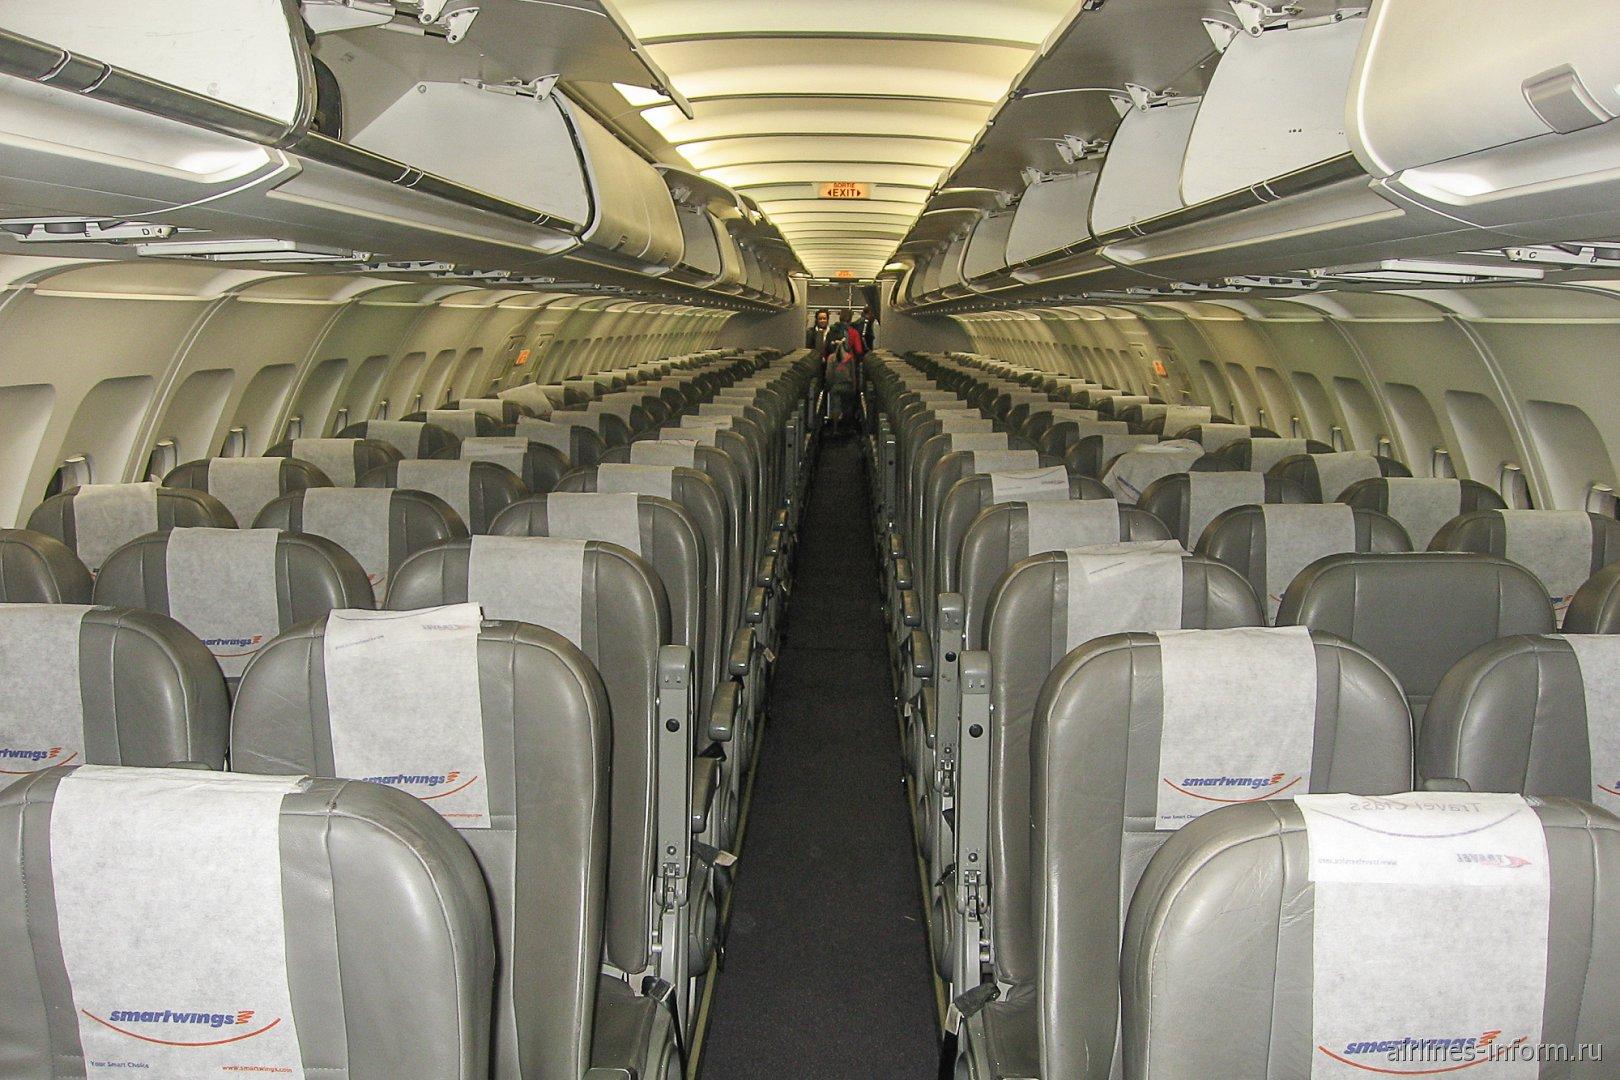 Пассажирский салон в самолете Airbus A320 TS-INP авиакомпании Nouvelair